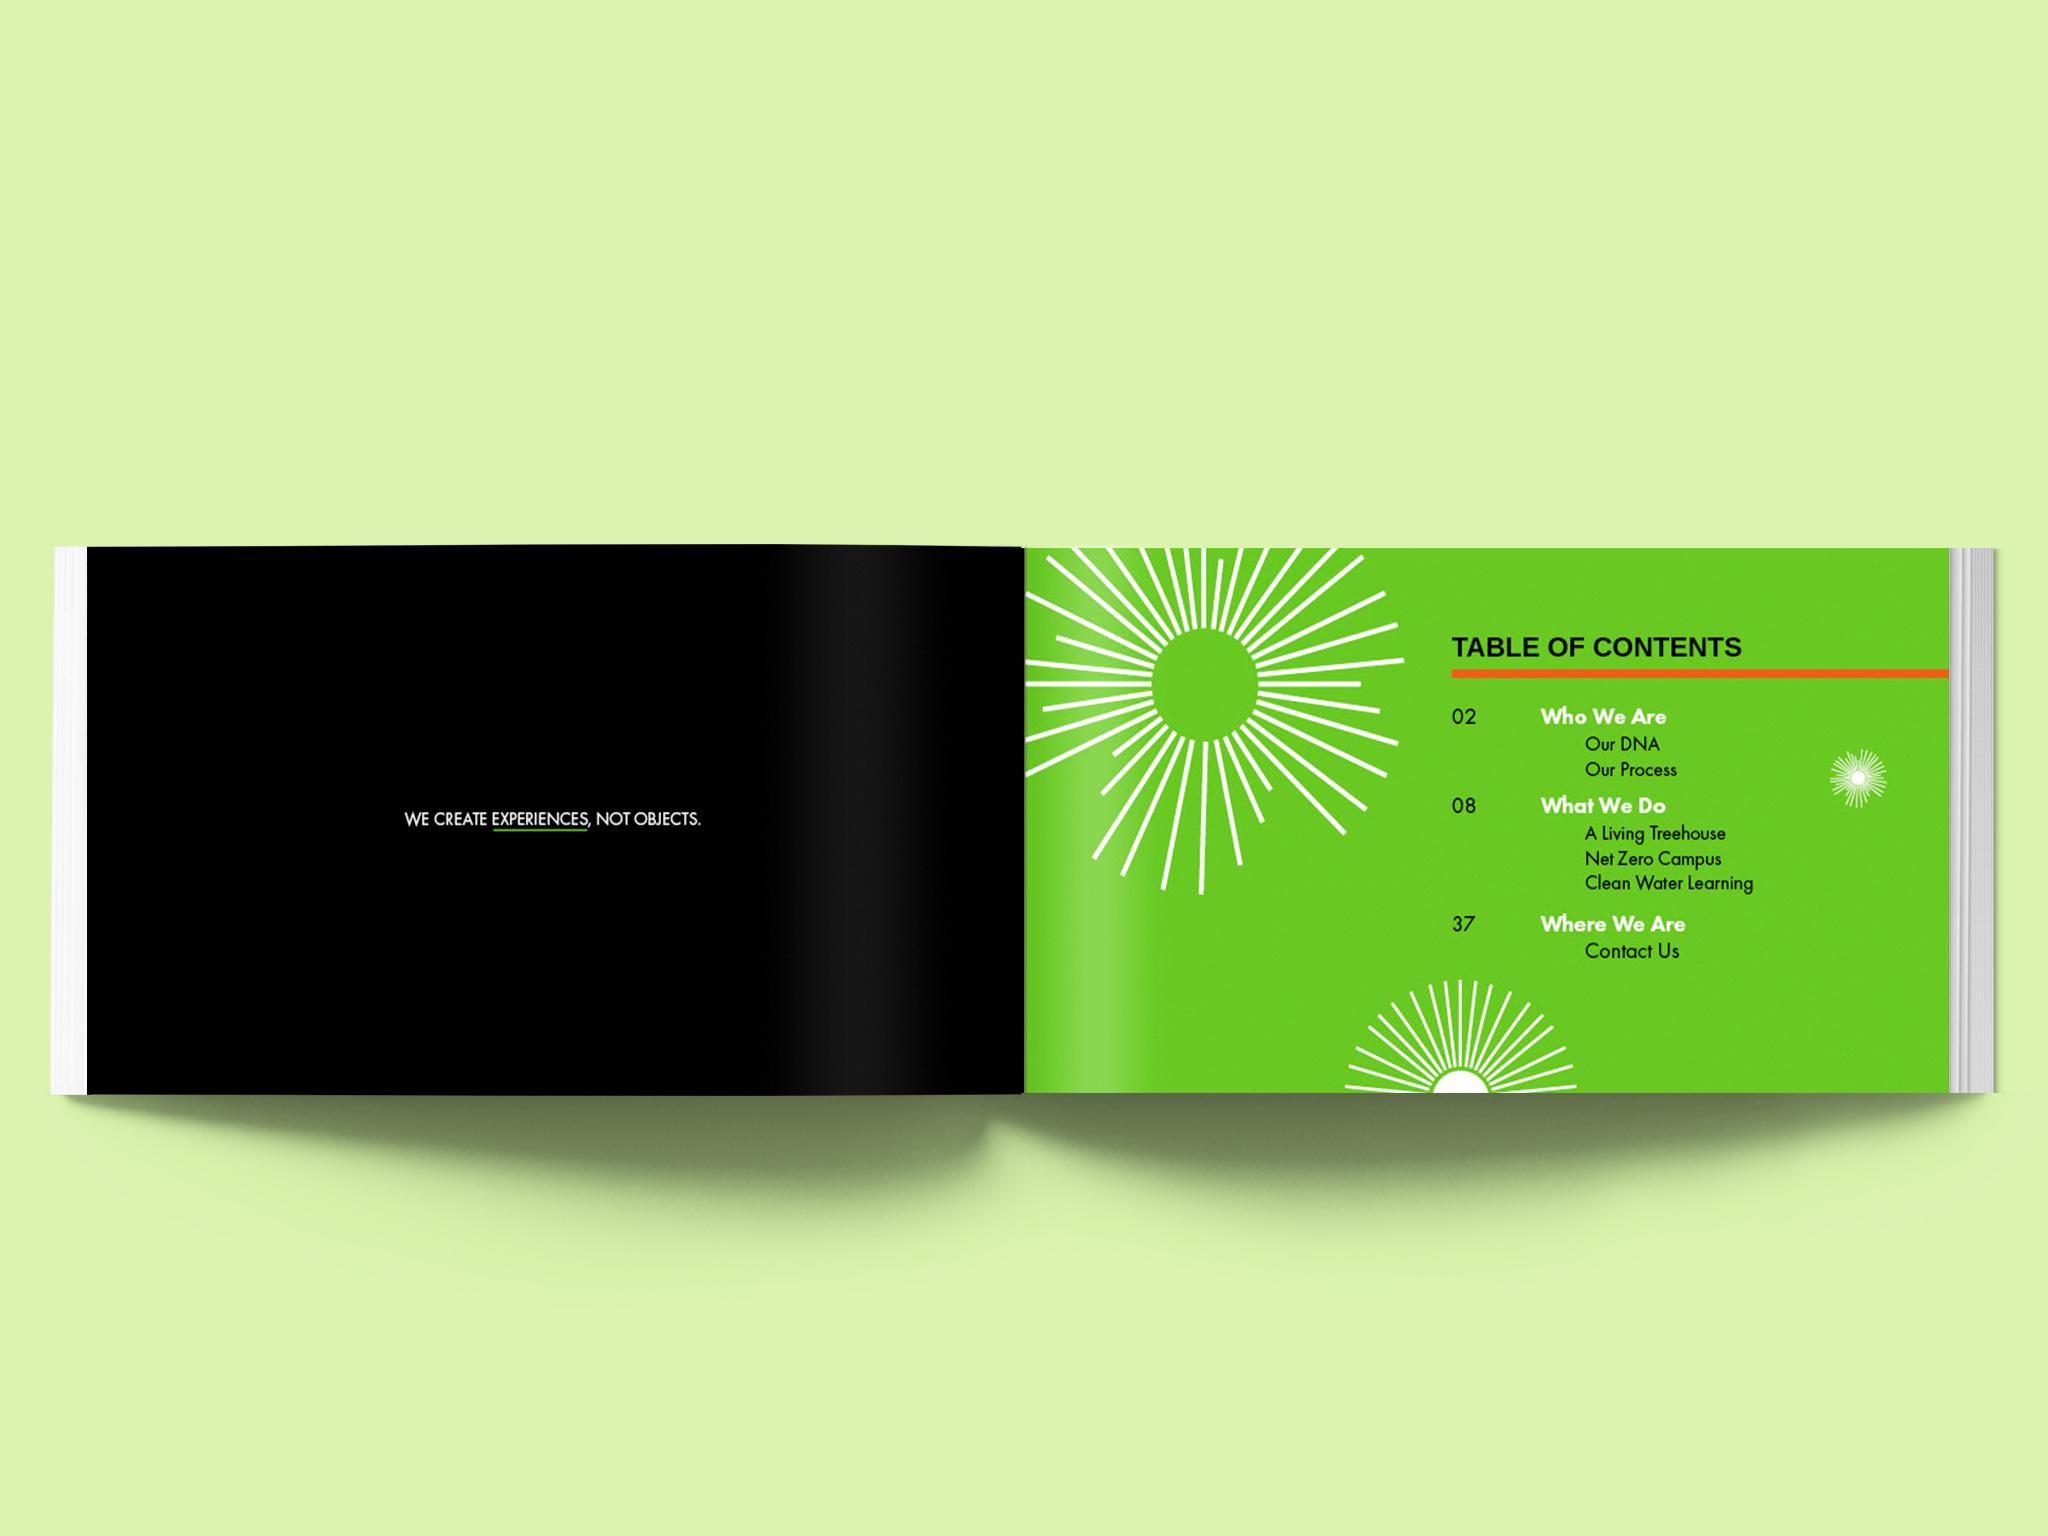 mithun_page4_green.jpg